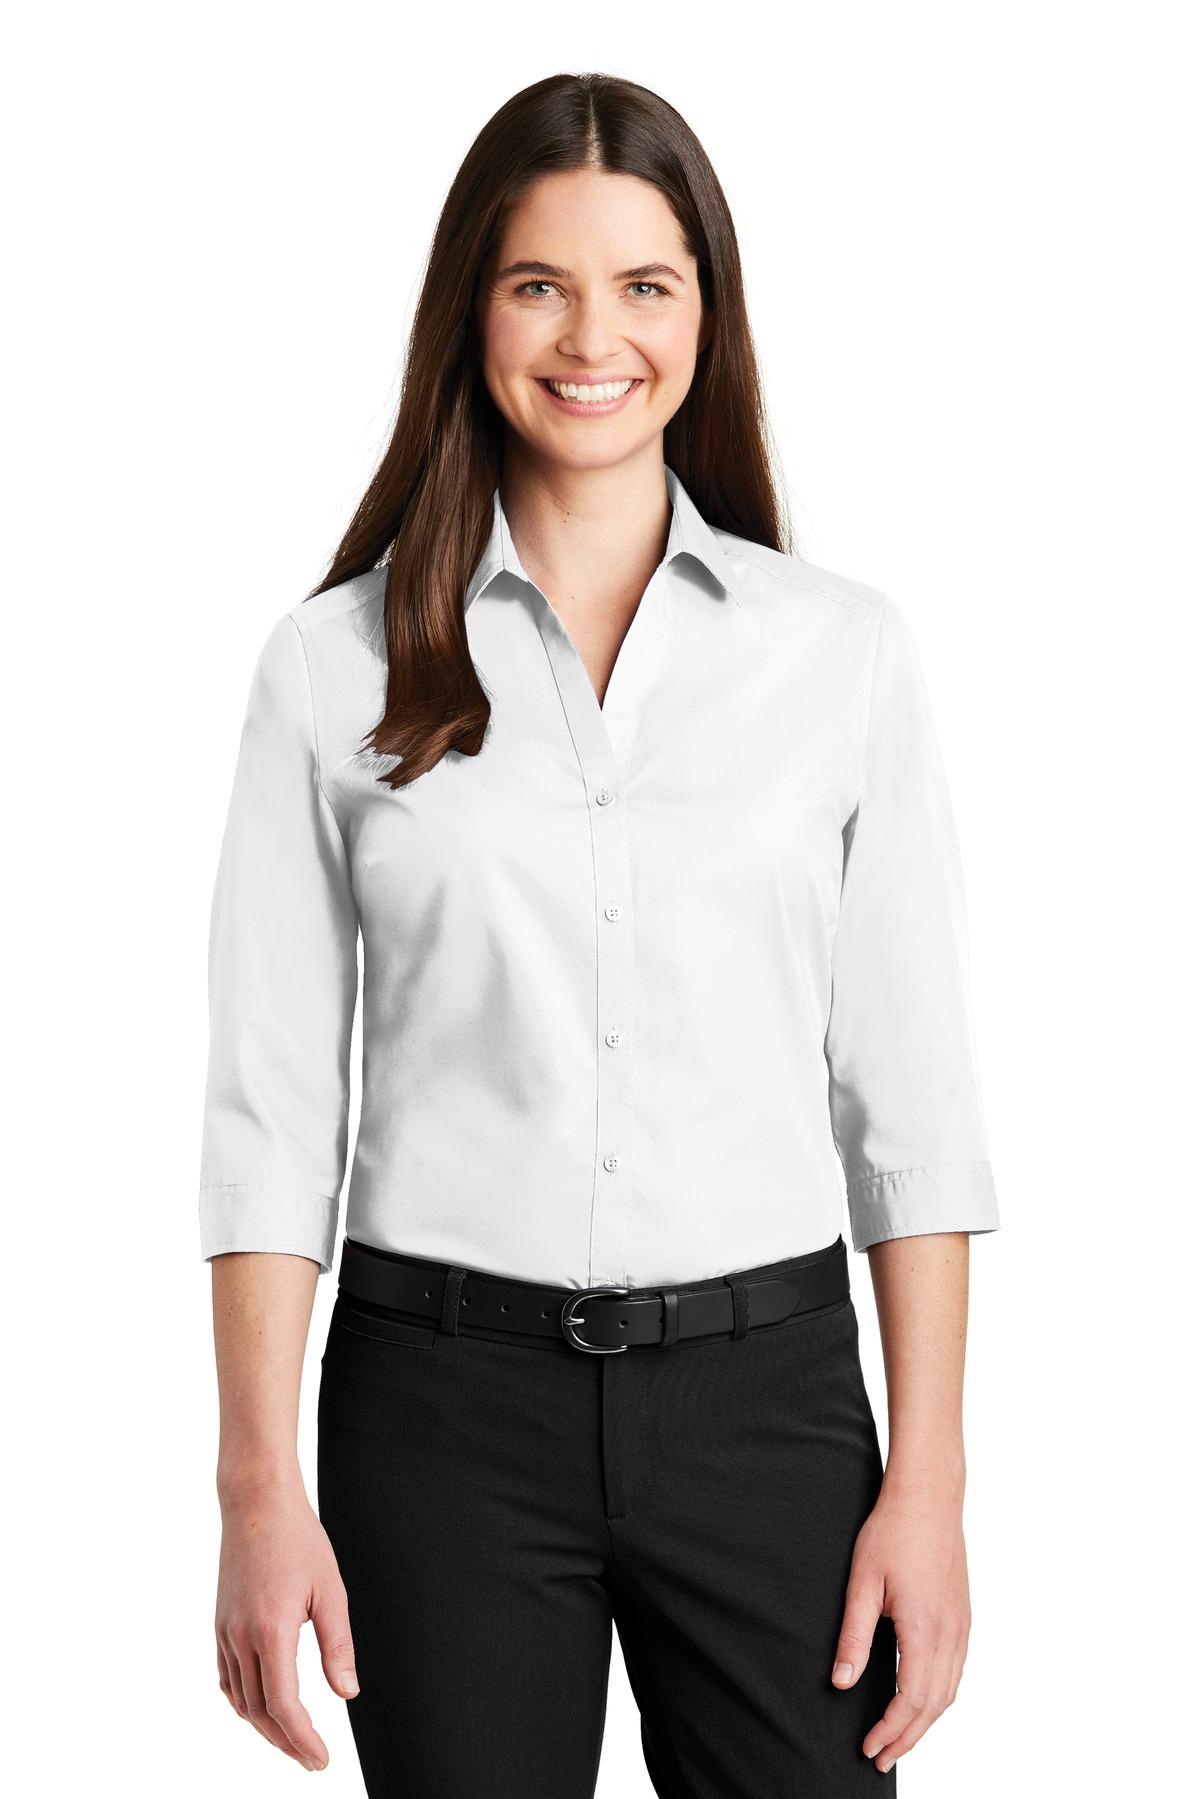 f0c403ed8 Port Authority ® Ladies 3/4-Sleeve Carefree Poplin Shirt. LW102